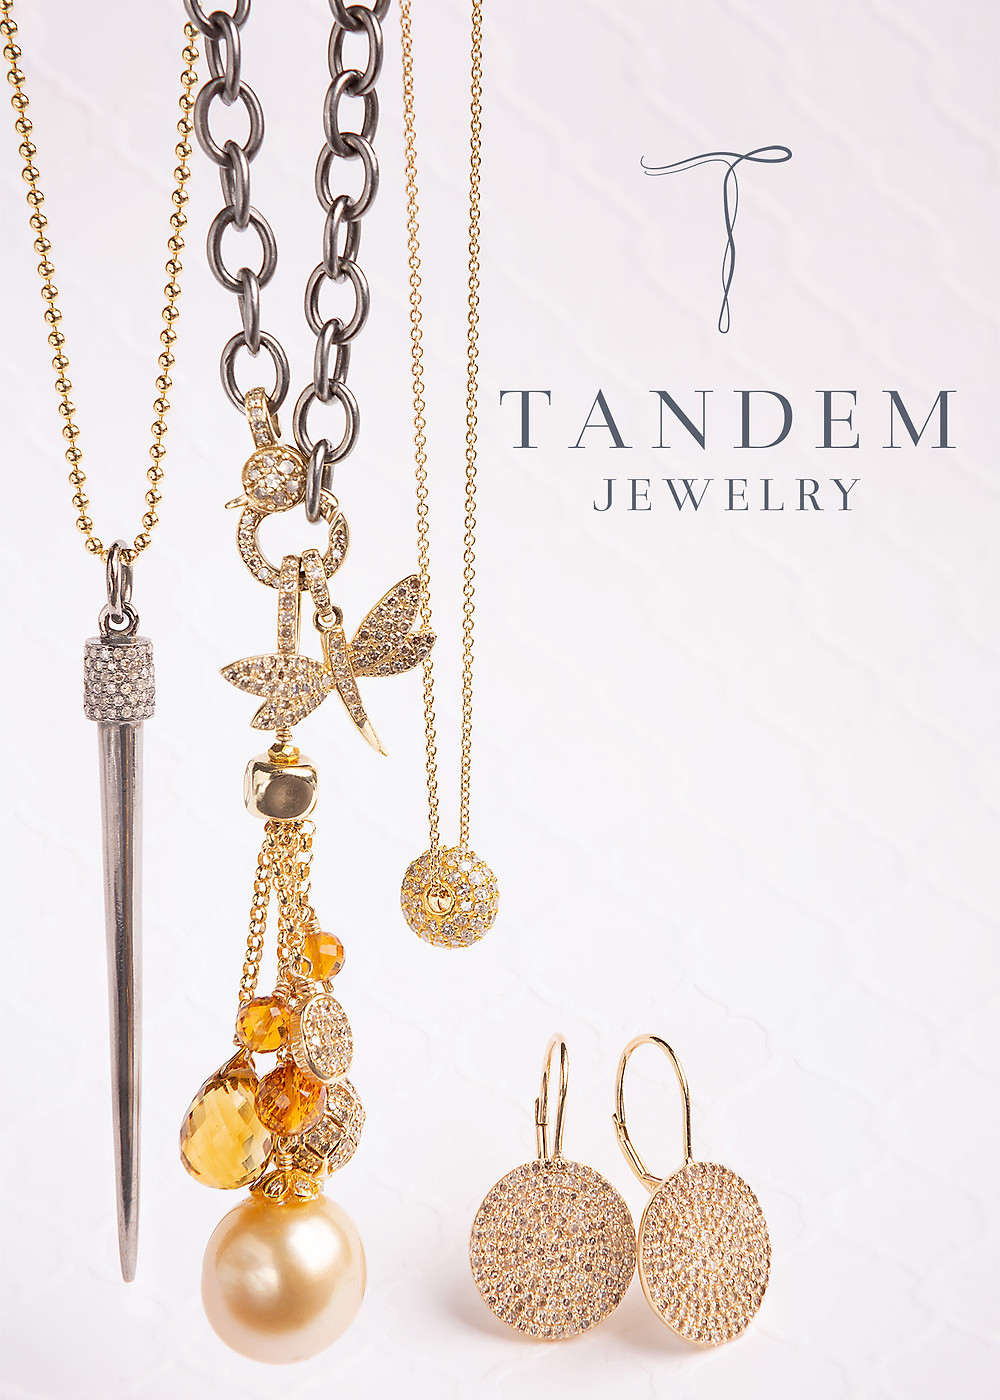 Tandem Fine Jewelry precious metals, sparkling diamonds, lustrous Tahitian pearls and semii-precious stones.